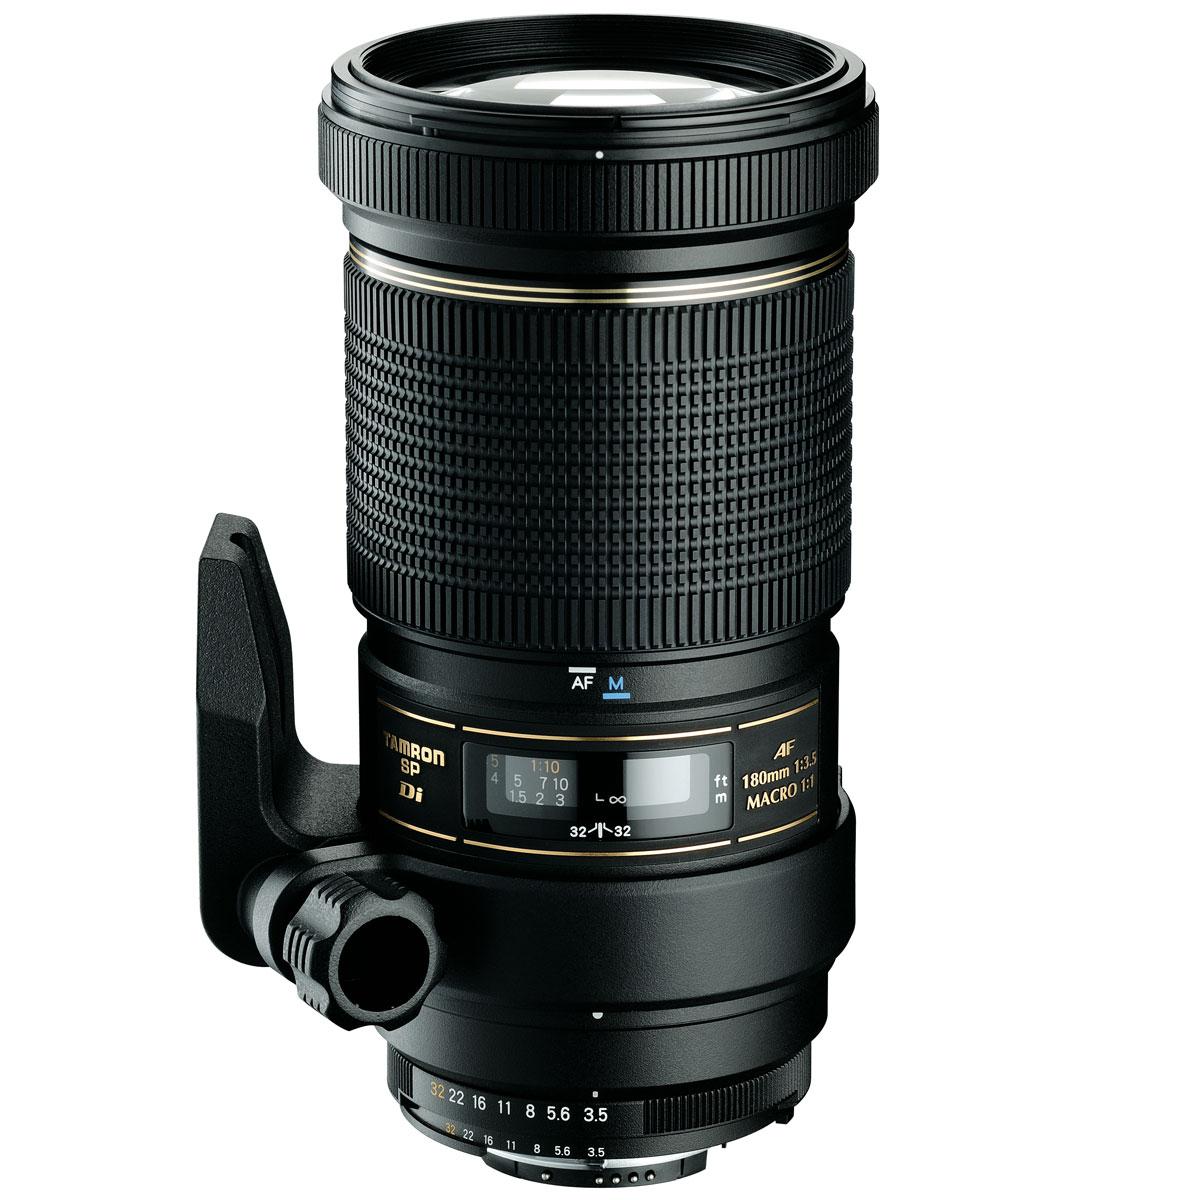 Tamron SP AF 180mm F/3.5 Di LD Macro, Nikon объектив